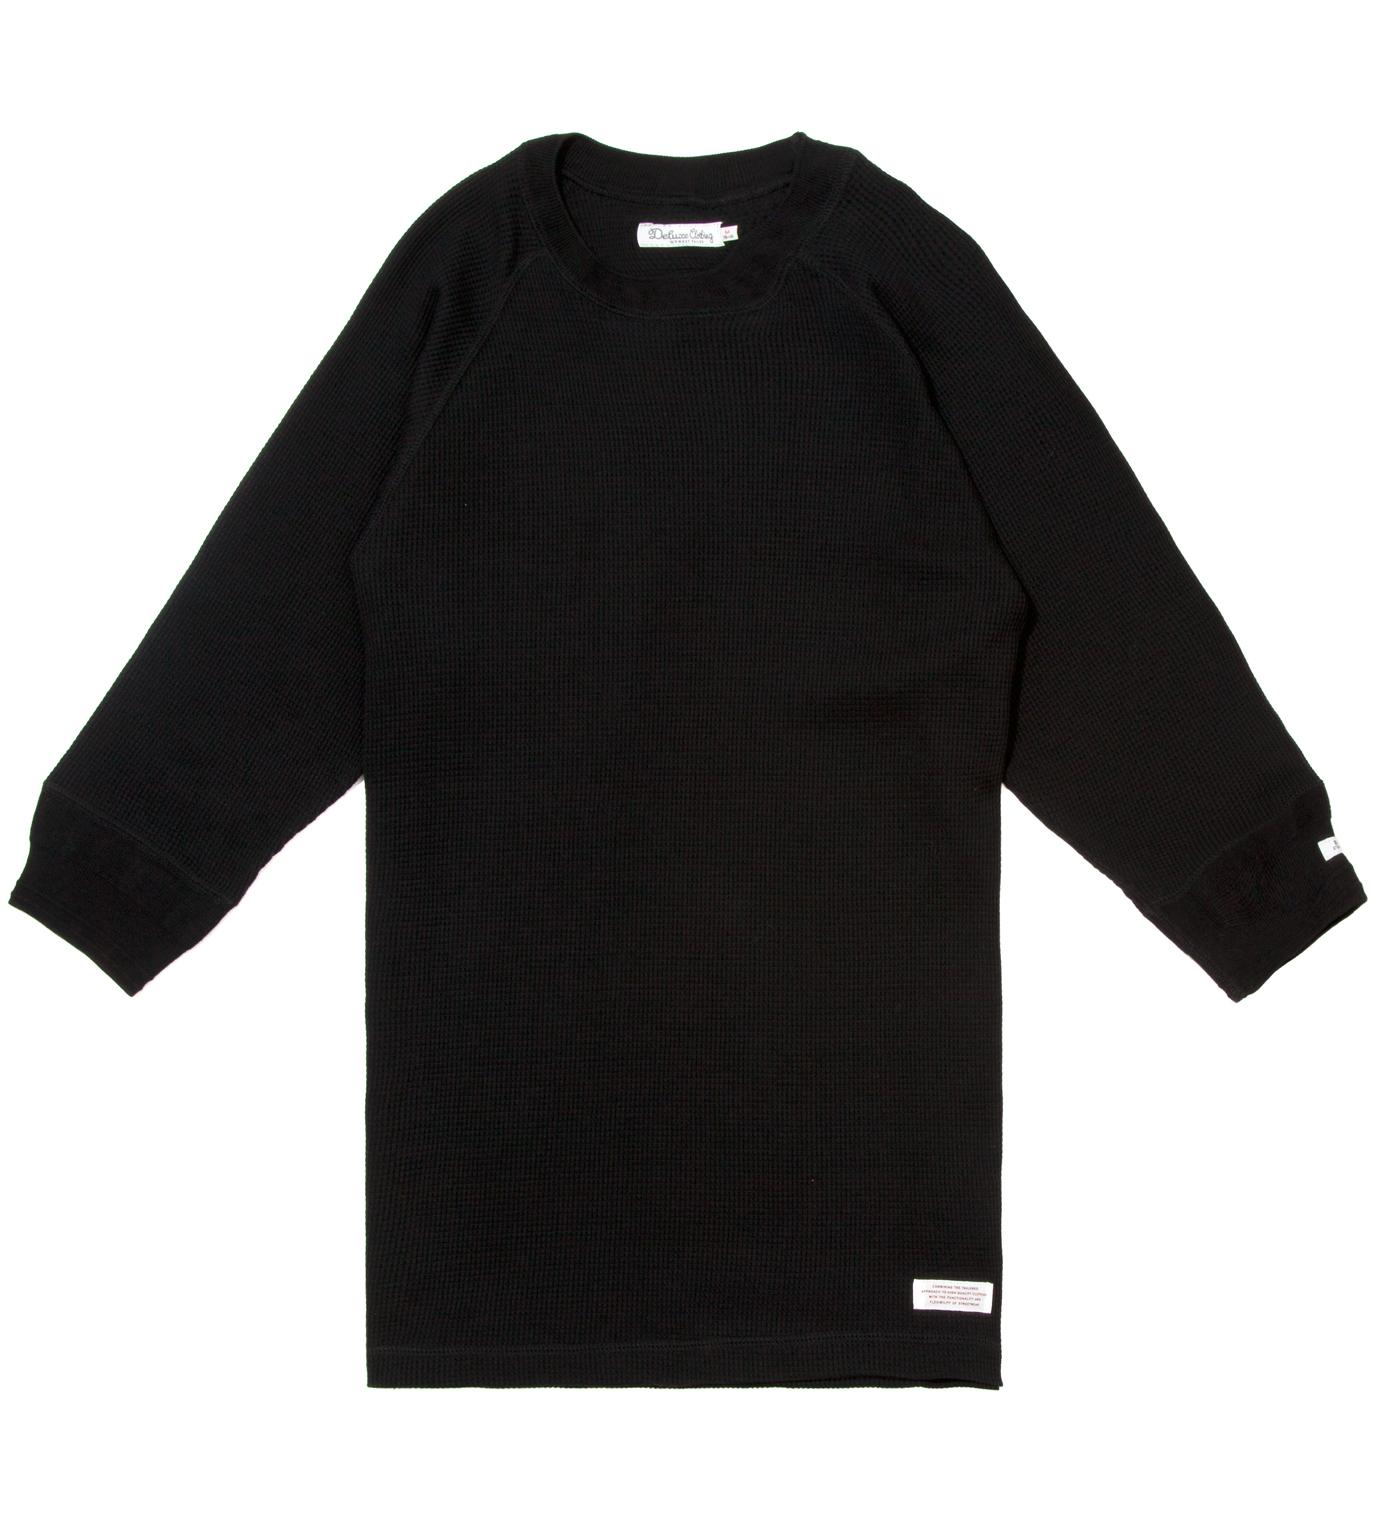 DELUXE Black Winston Crewneck Shirt